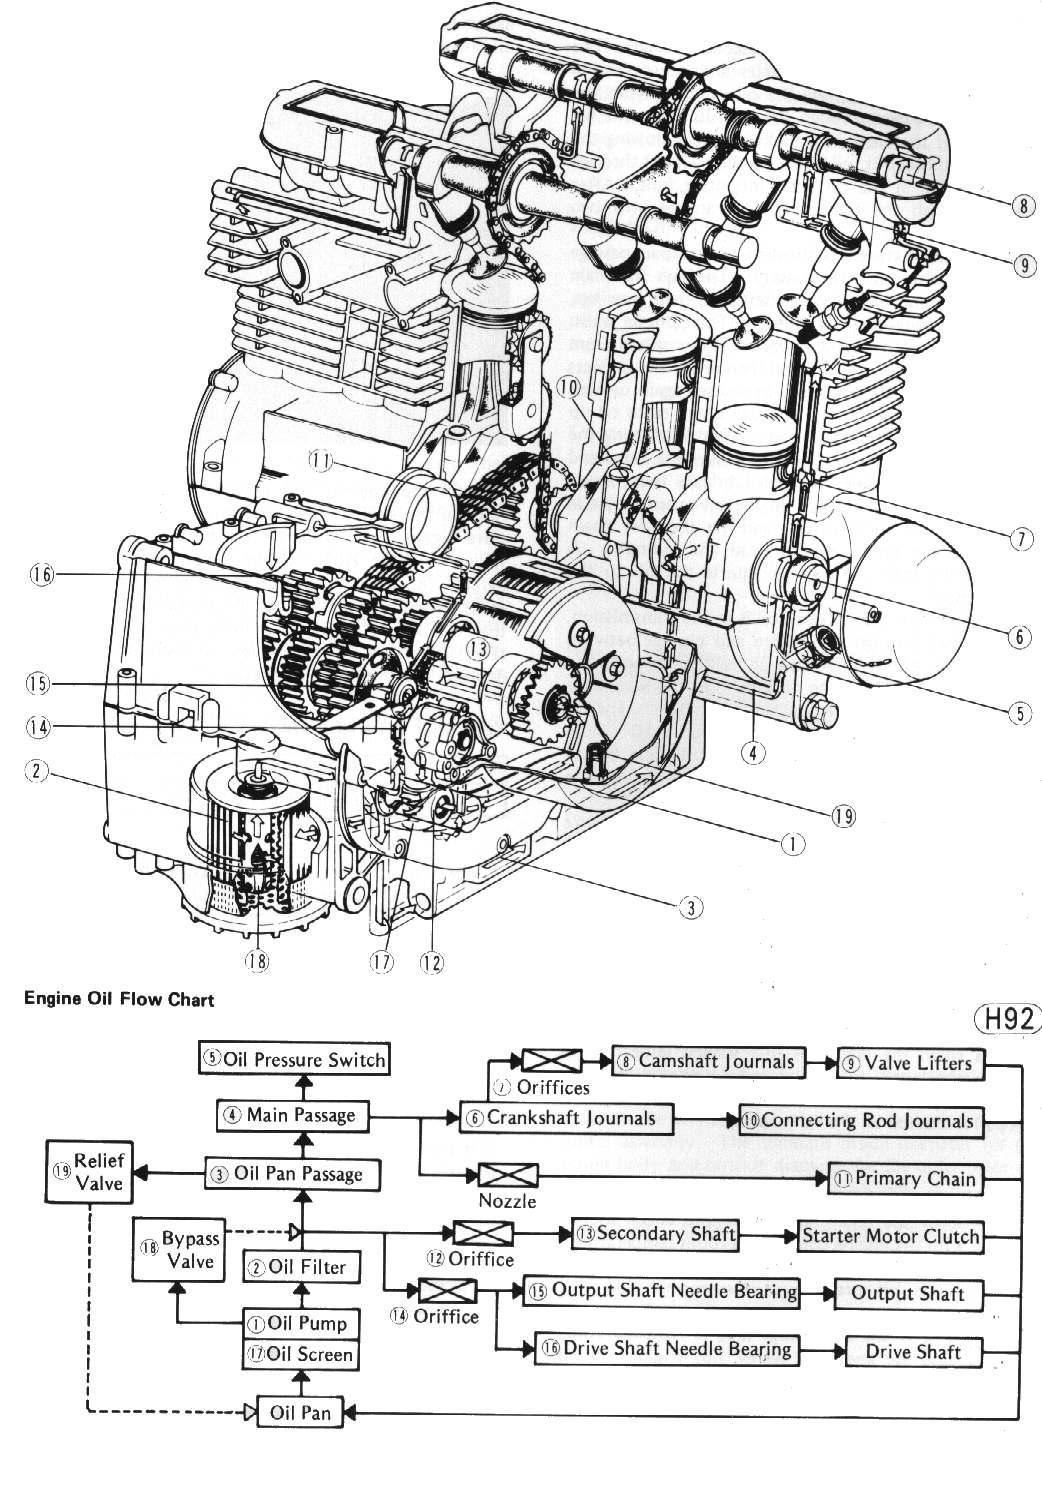 Process Flow Chart Engine Schematic